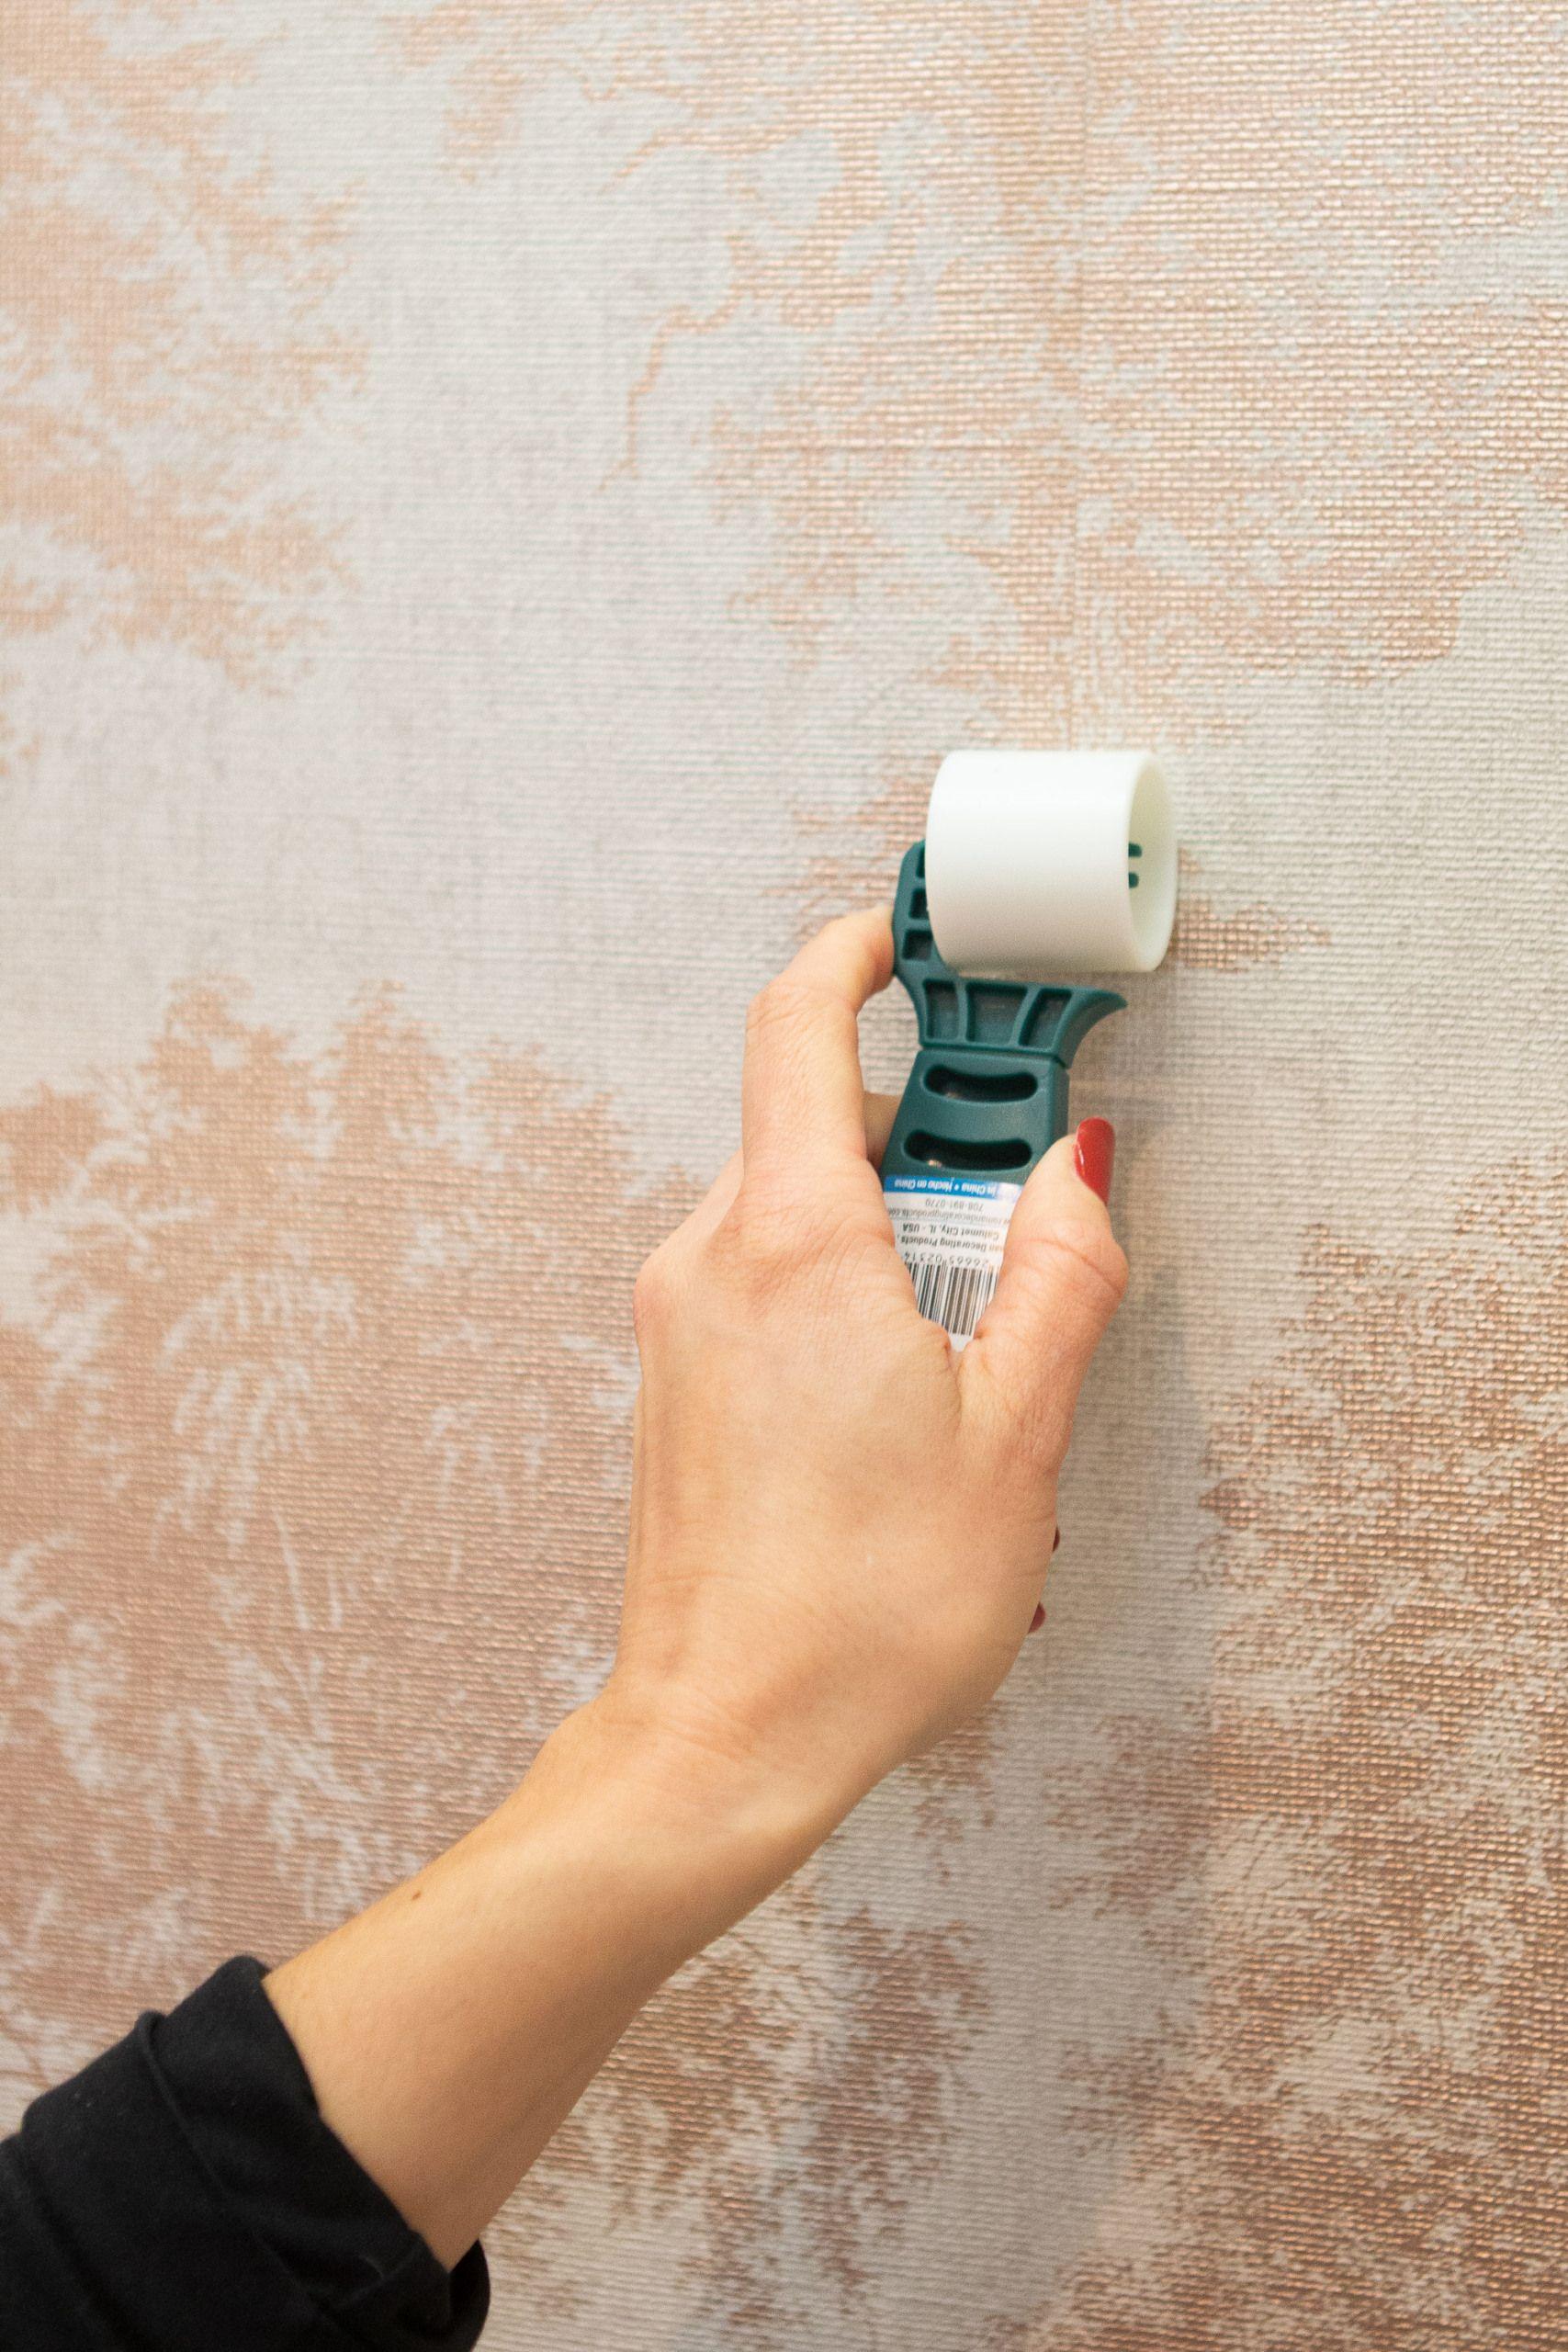 How to Wallpaper a Closet Diy playbook, Diy wallpaper